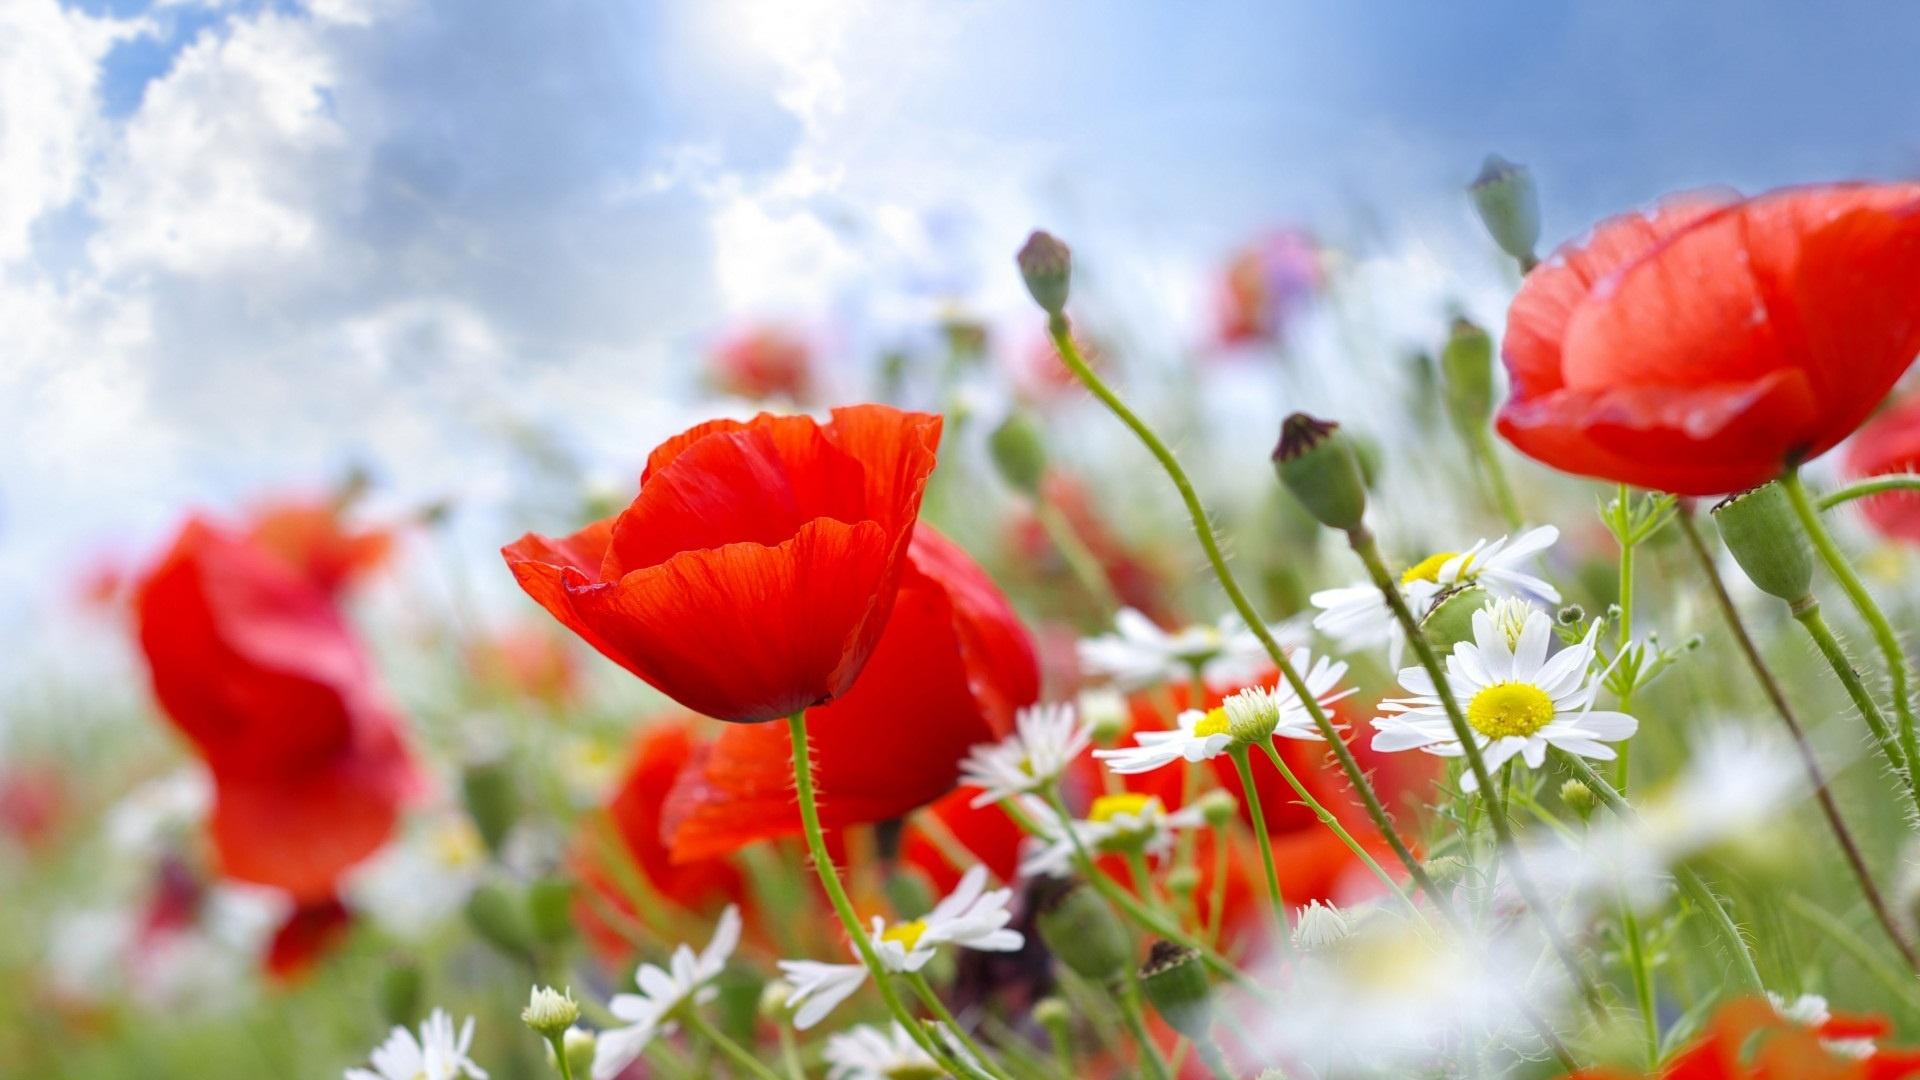 flower wallpapers 1920x1080 red summer flowers 29990 30709 hd 1920x1080